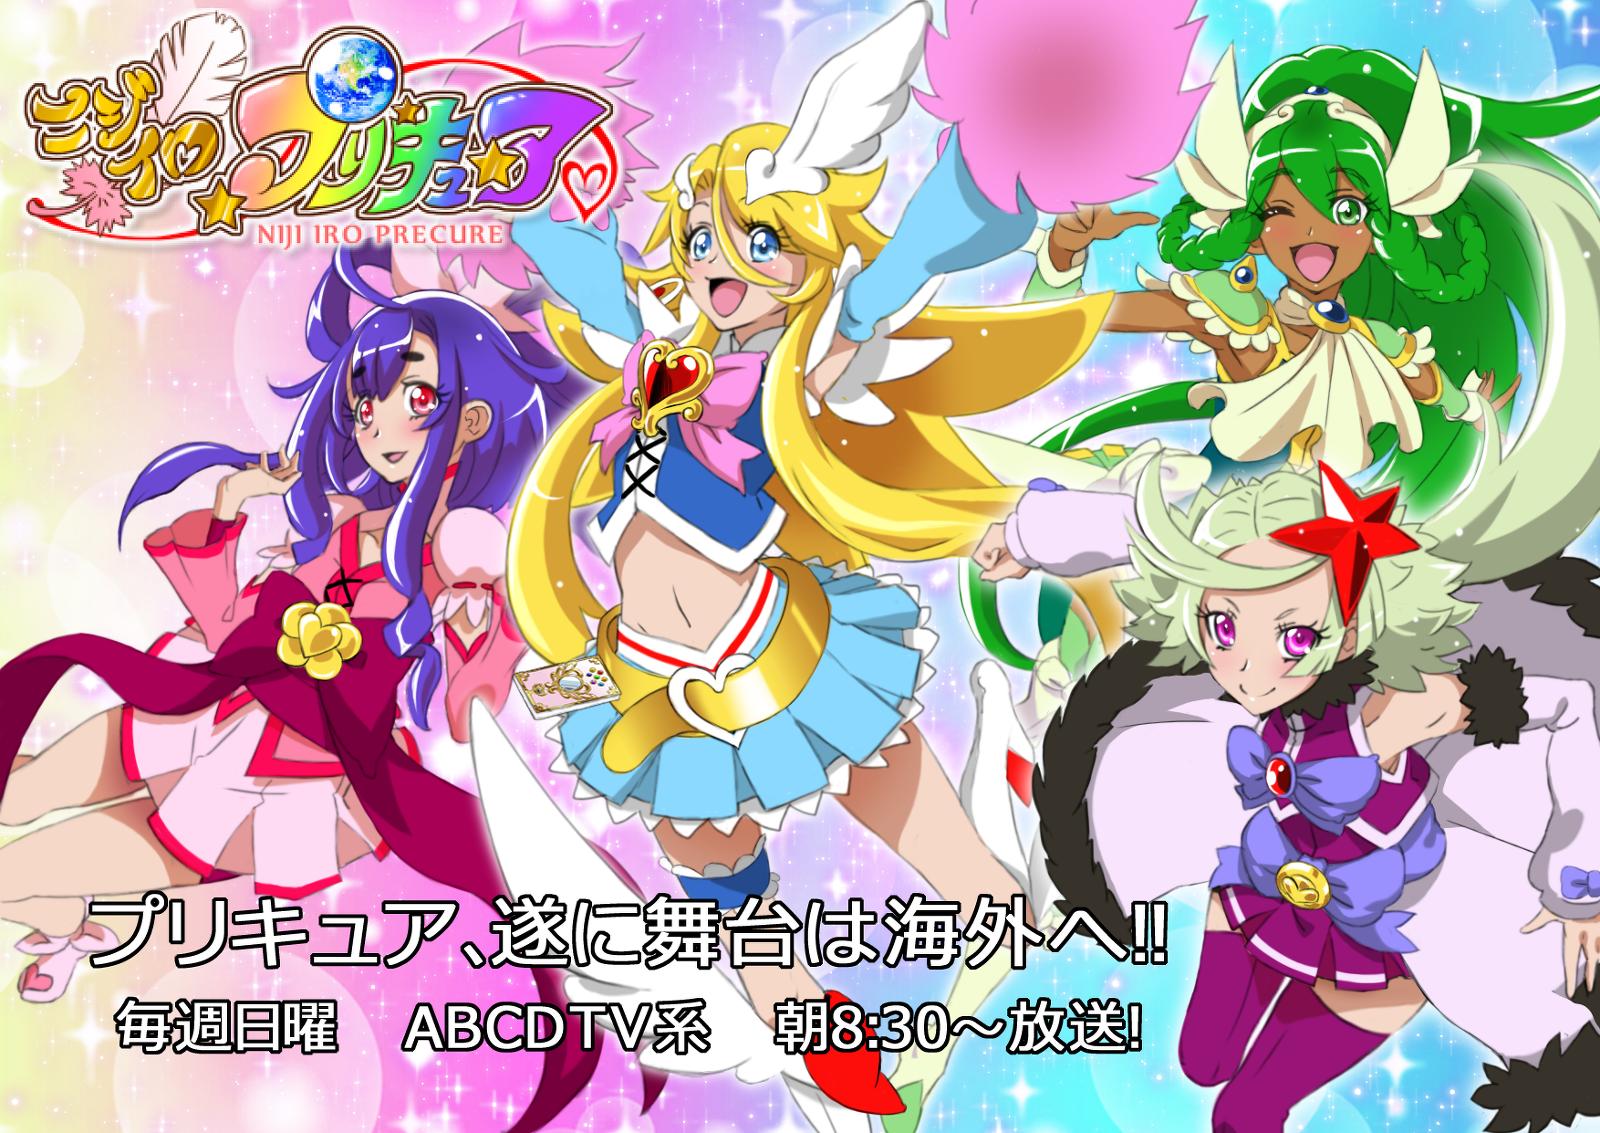 Niji Iro Pretty Cure! | Fandom of Pretty Cure Wiki | Fandom powered by ...